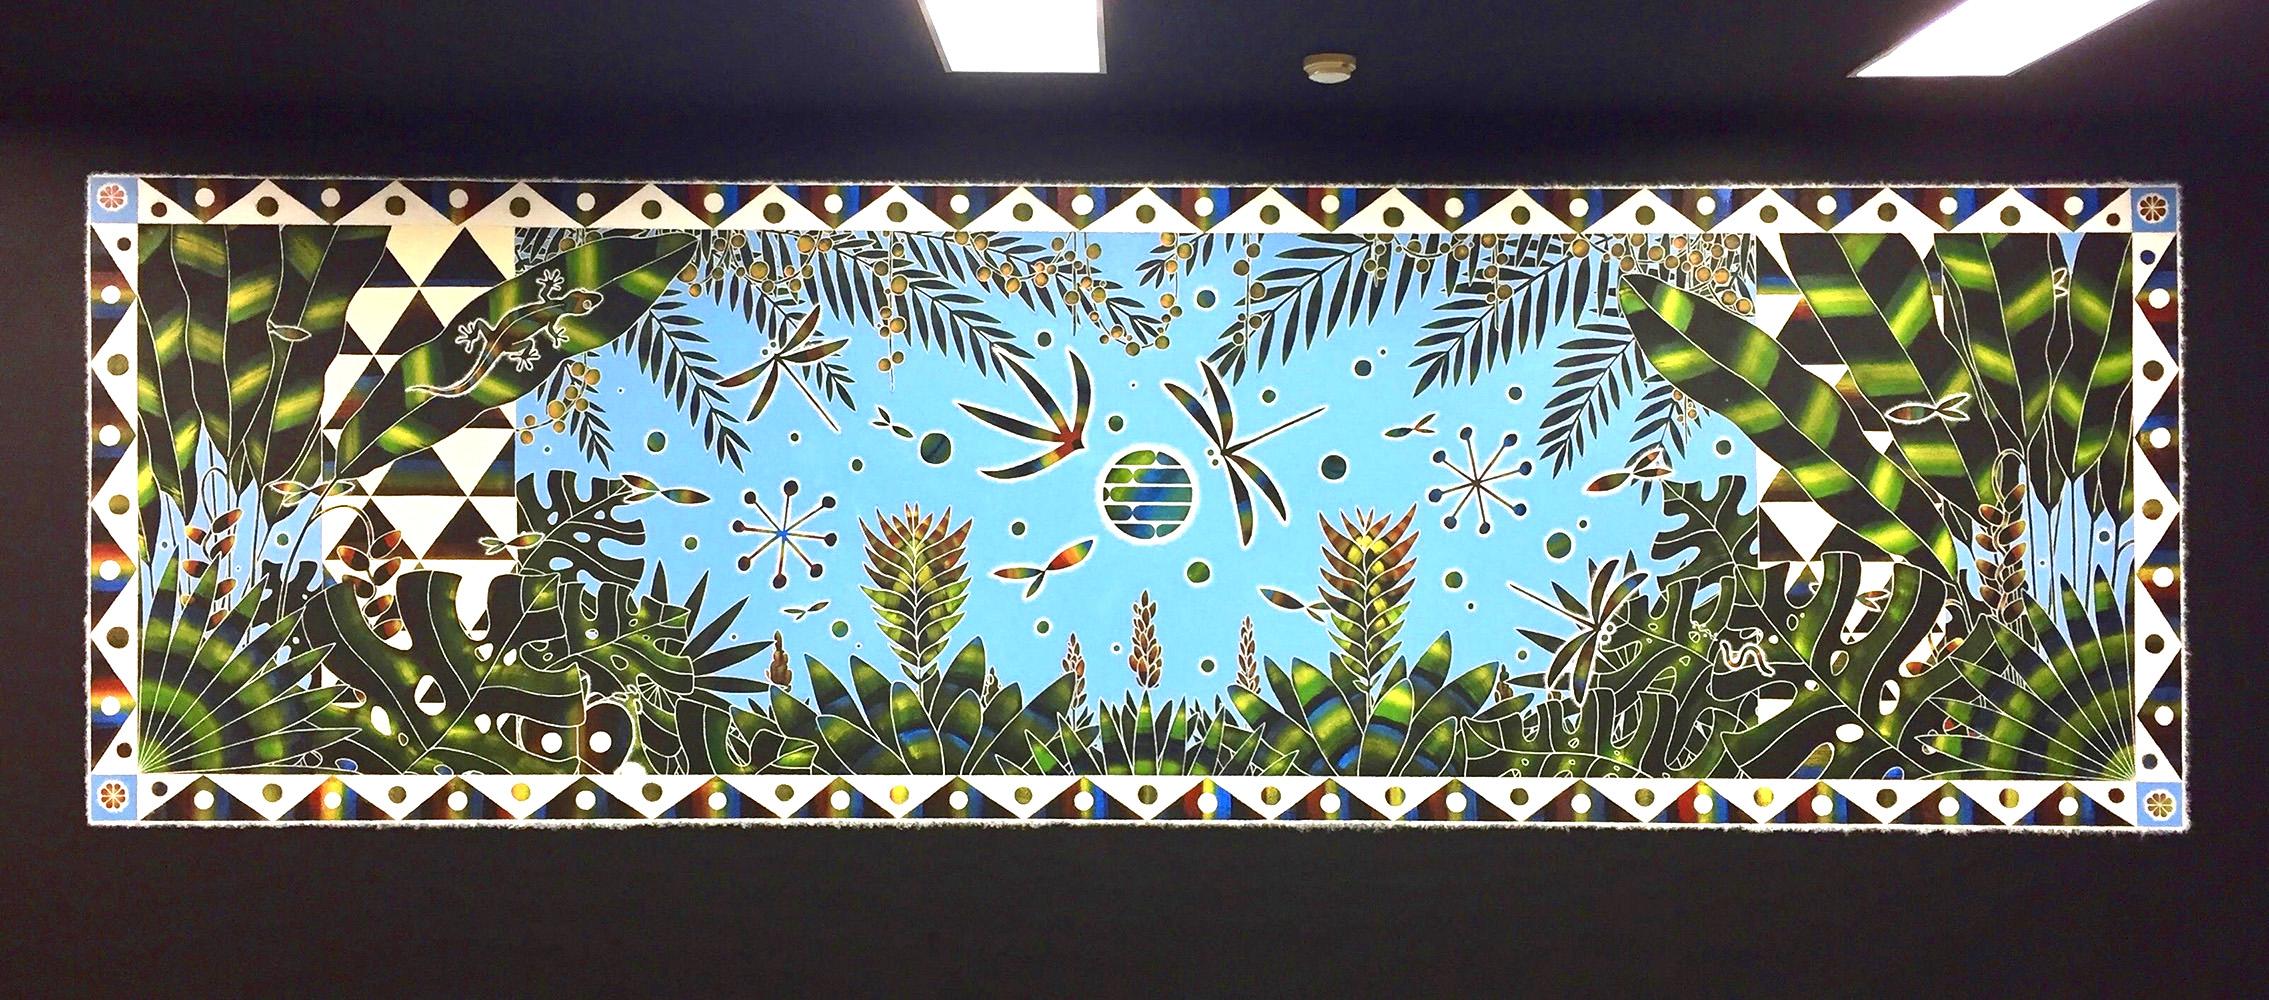 [Selva tropical]